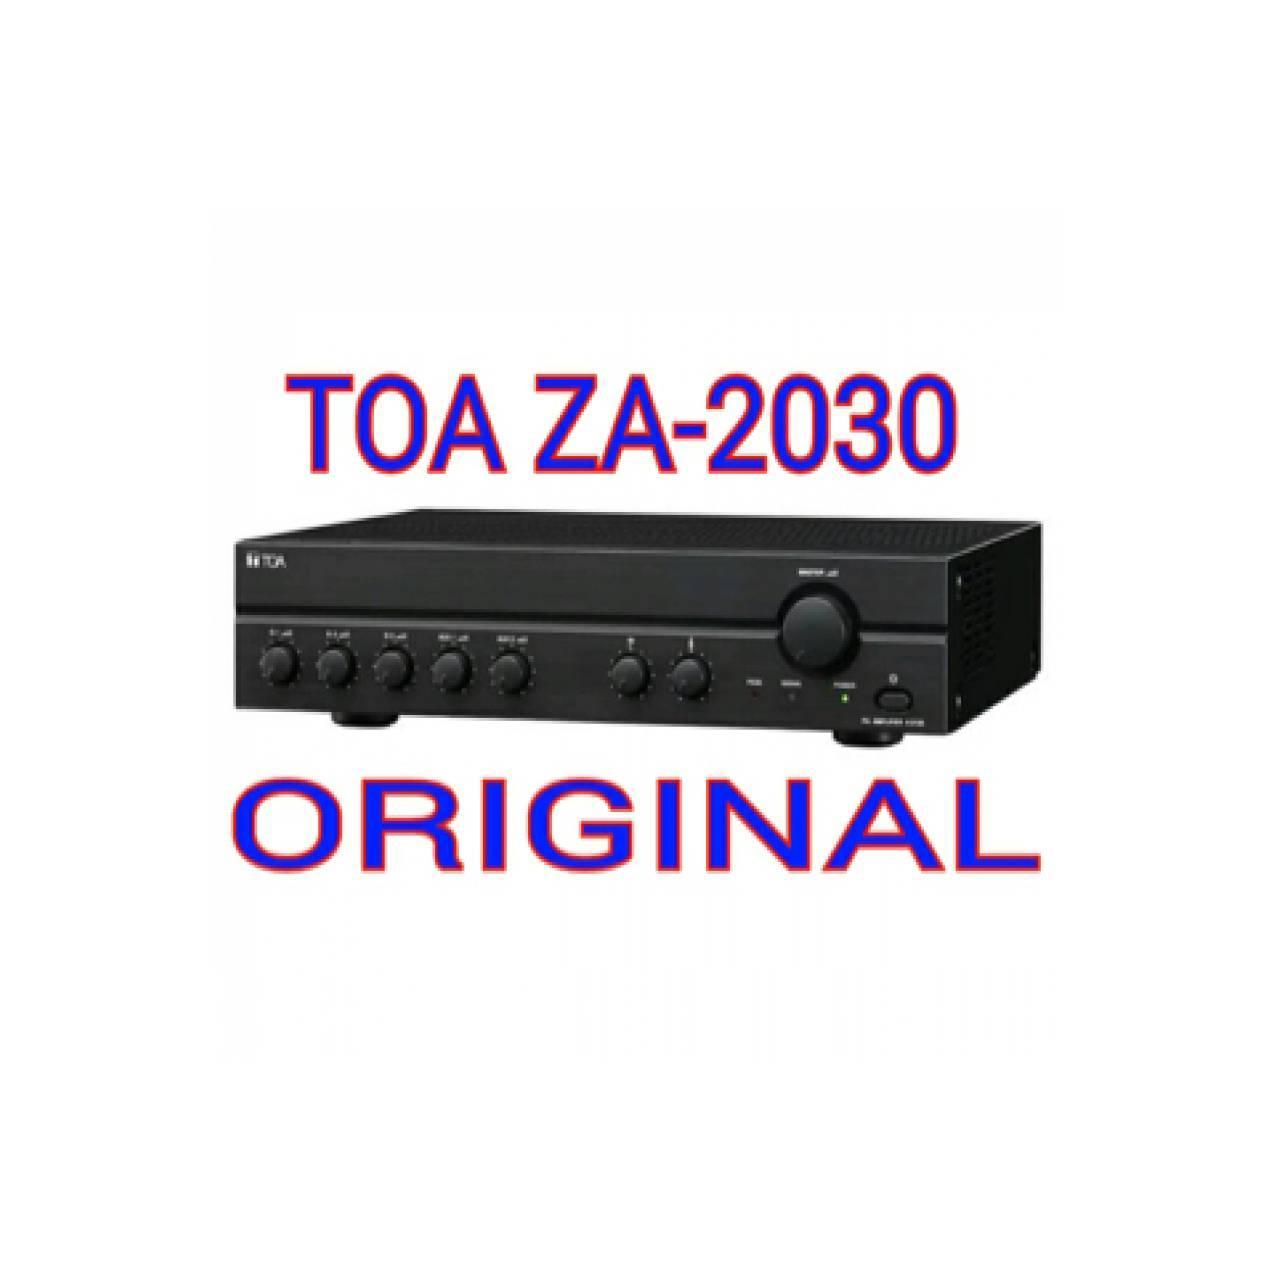 Murah !!! Ampli Fier Mixer Toa Za 2030 (Original)